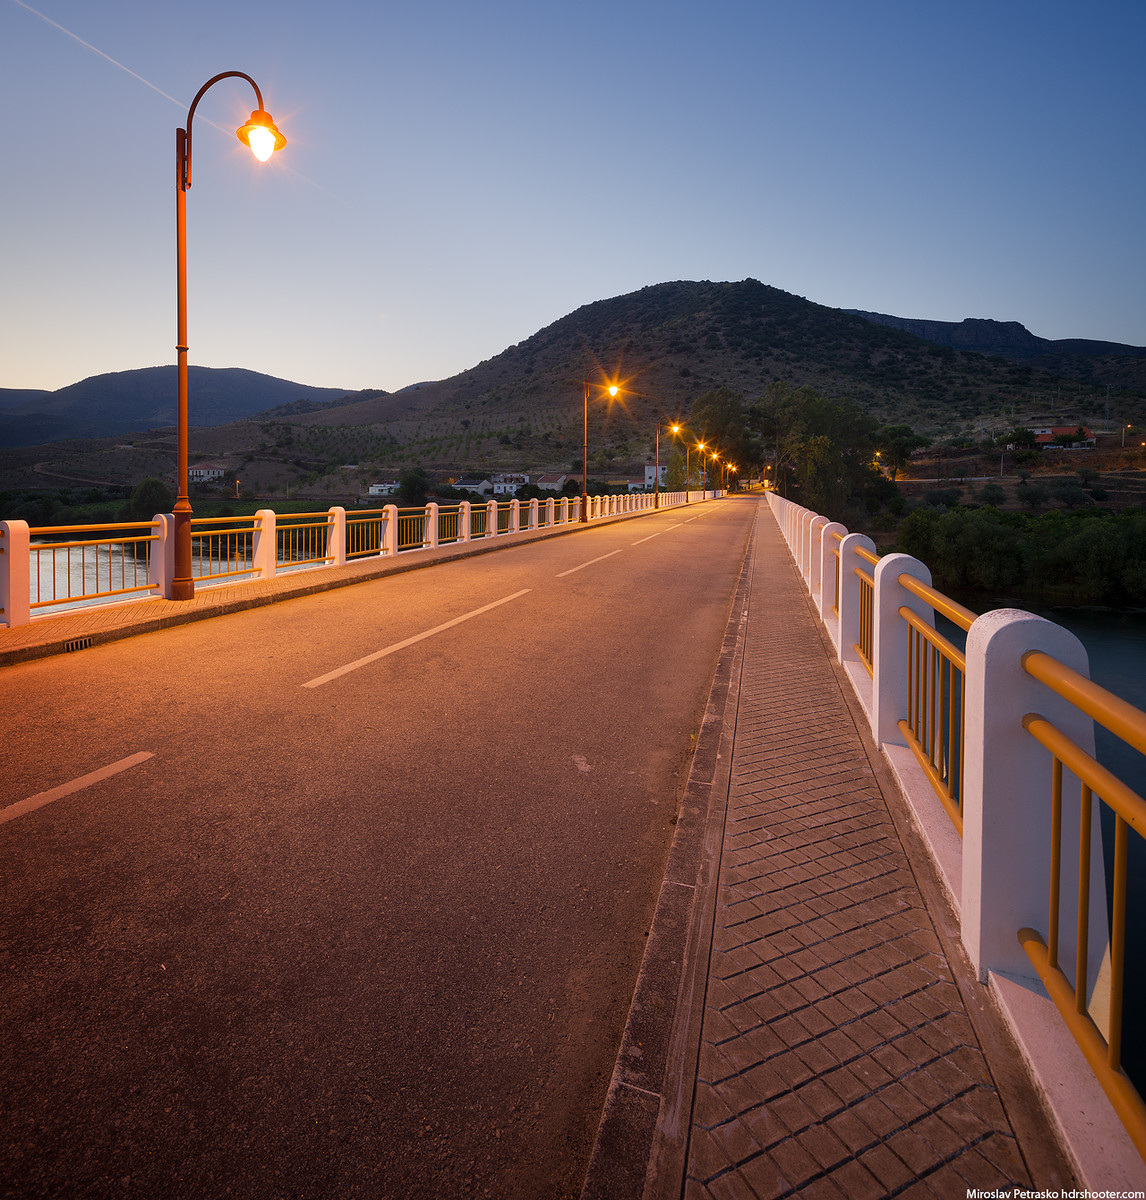 Crossing the bridge in Barca De Alva